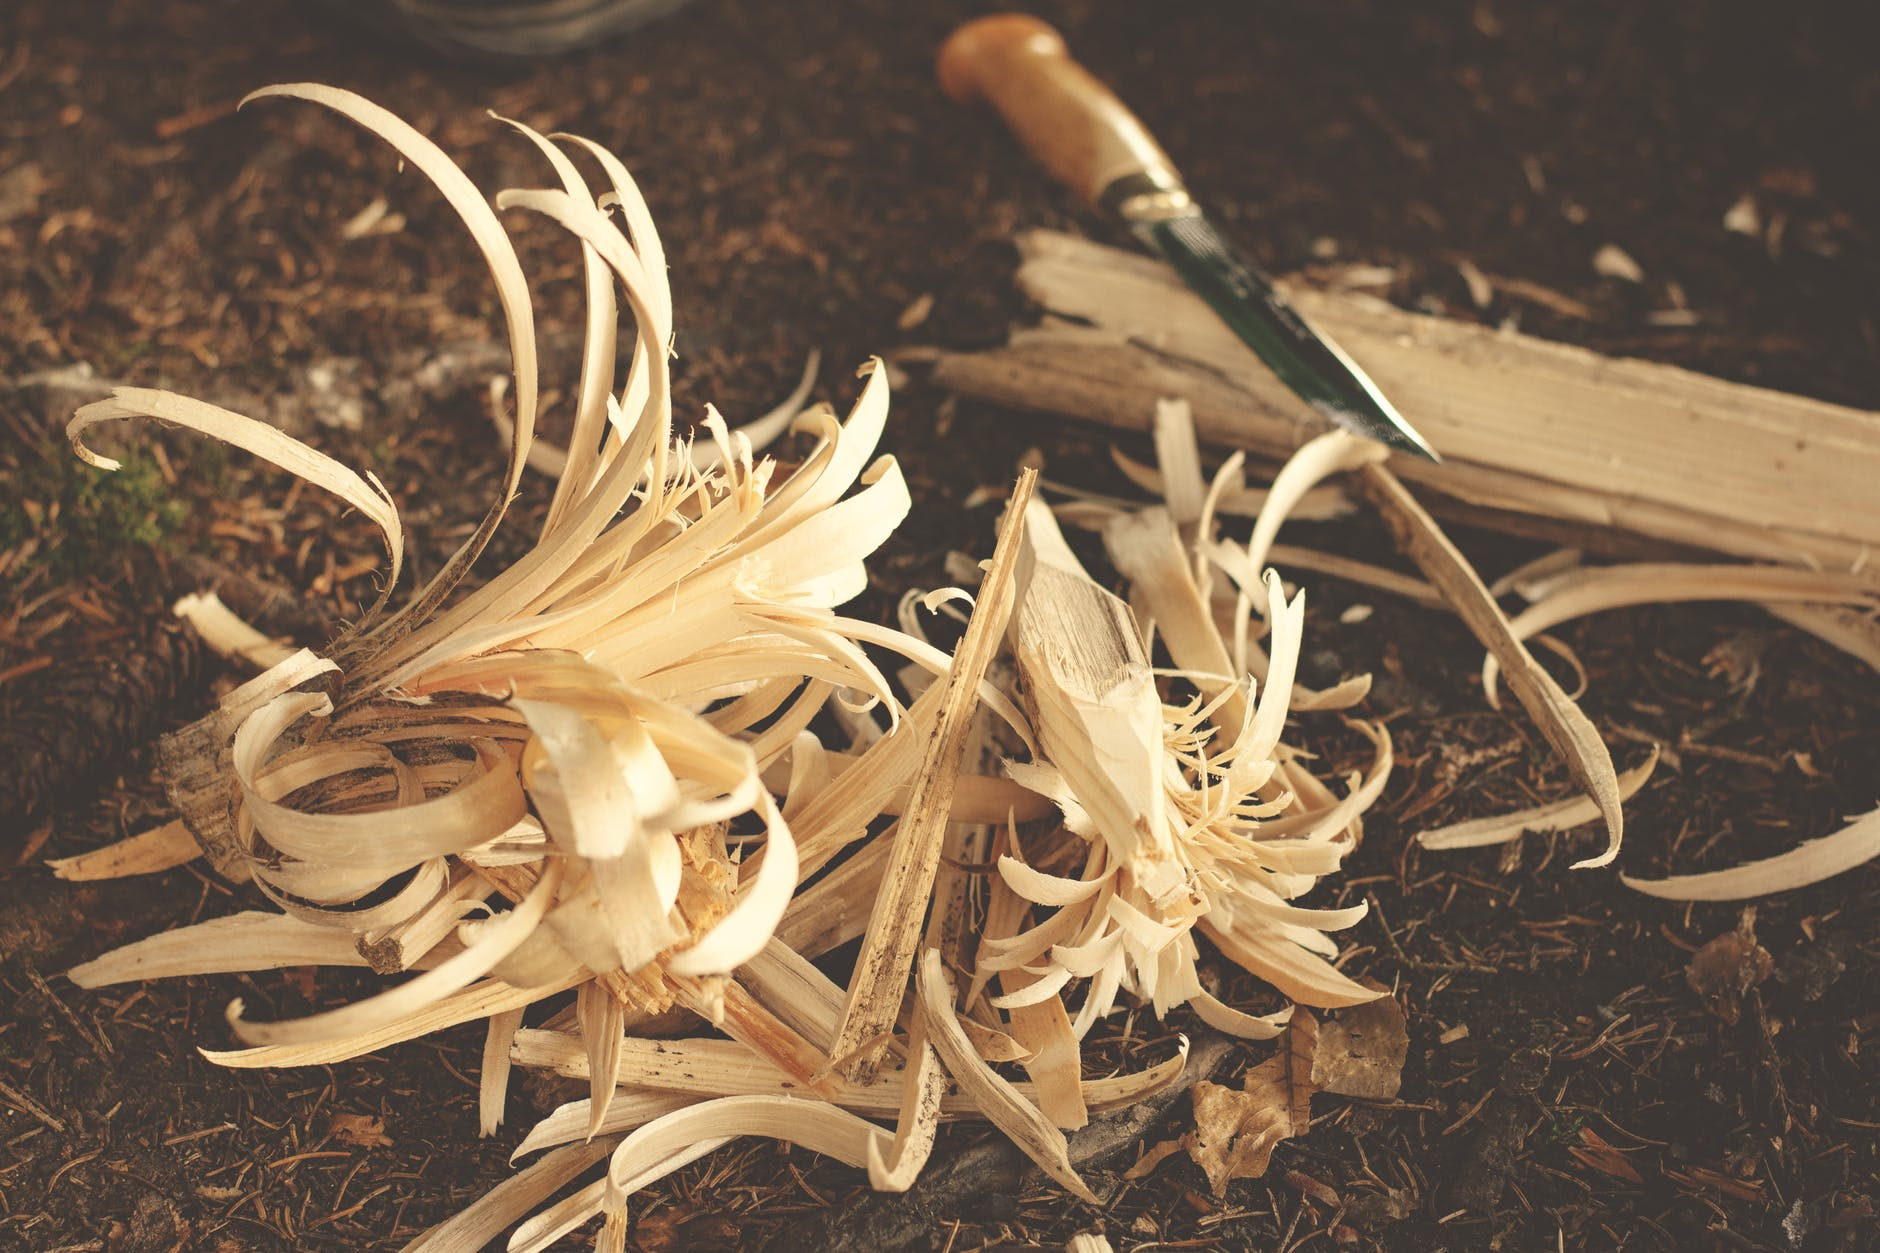 bushcraft dry knife wood